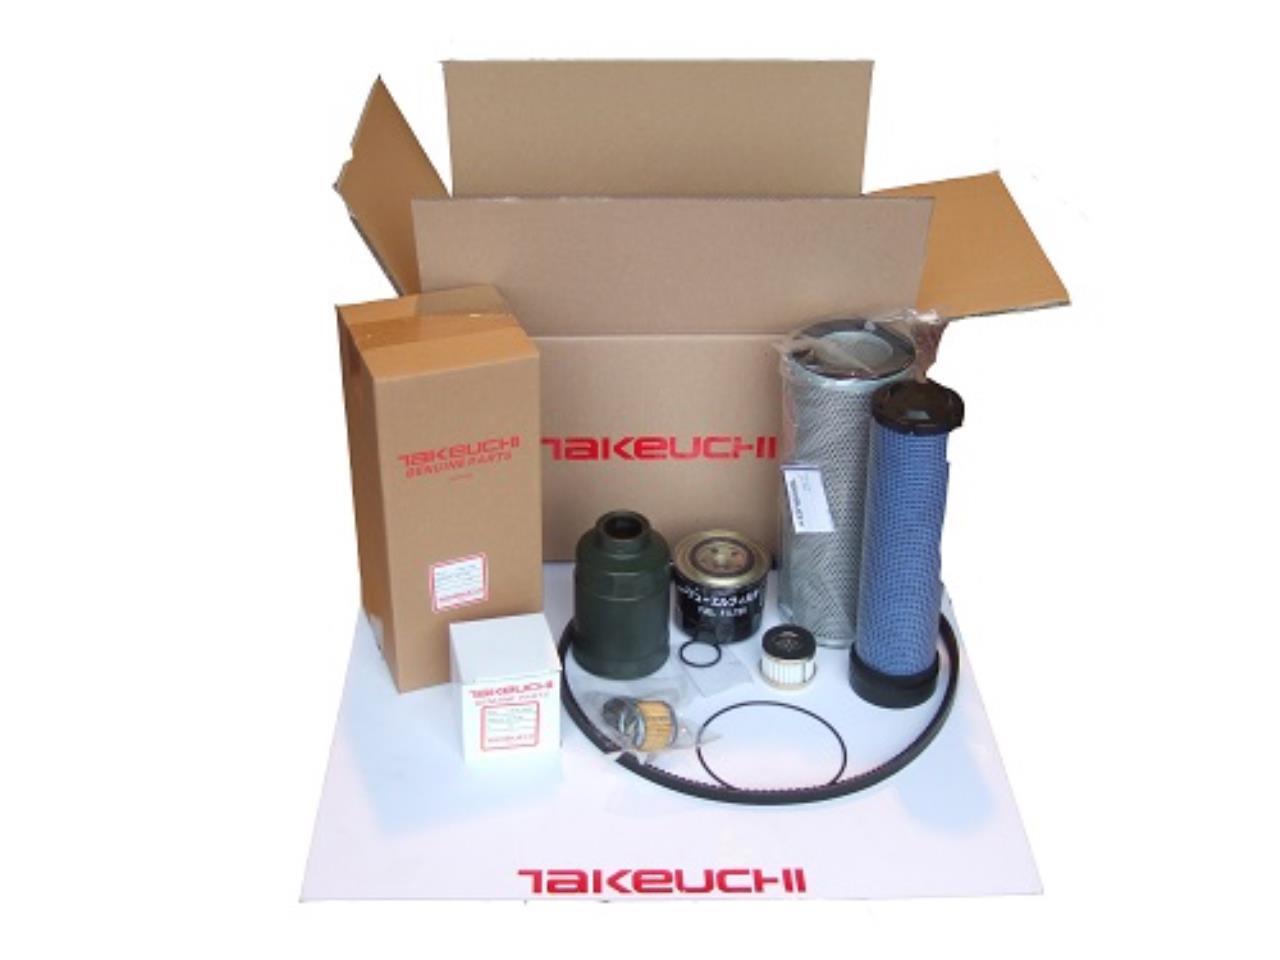 Takeuchi TB016 filtersæt